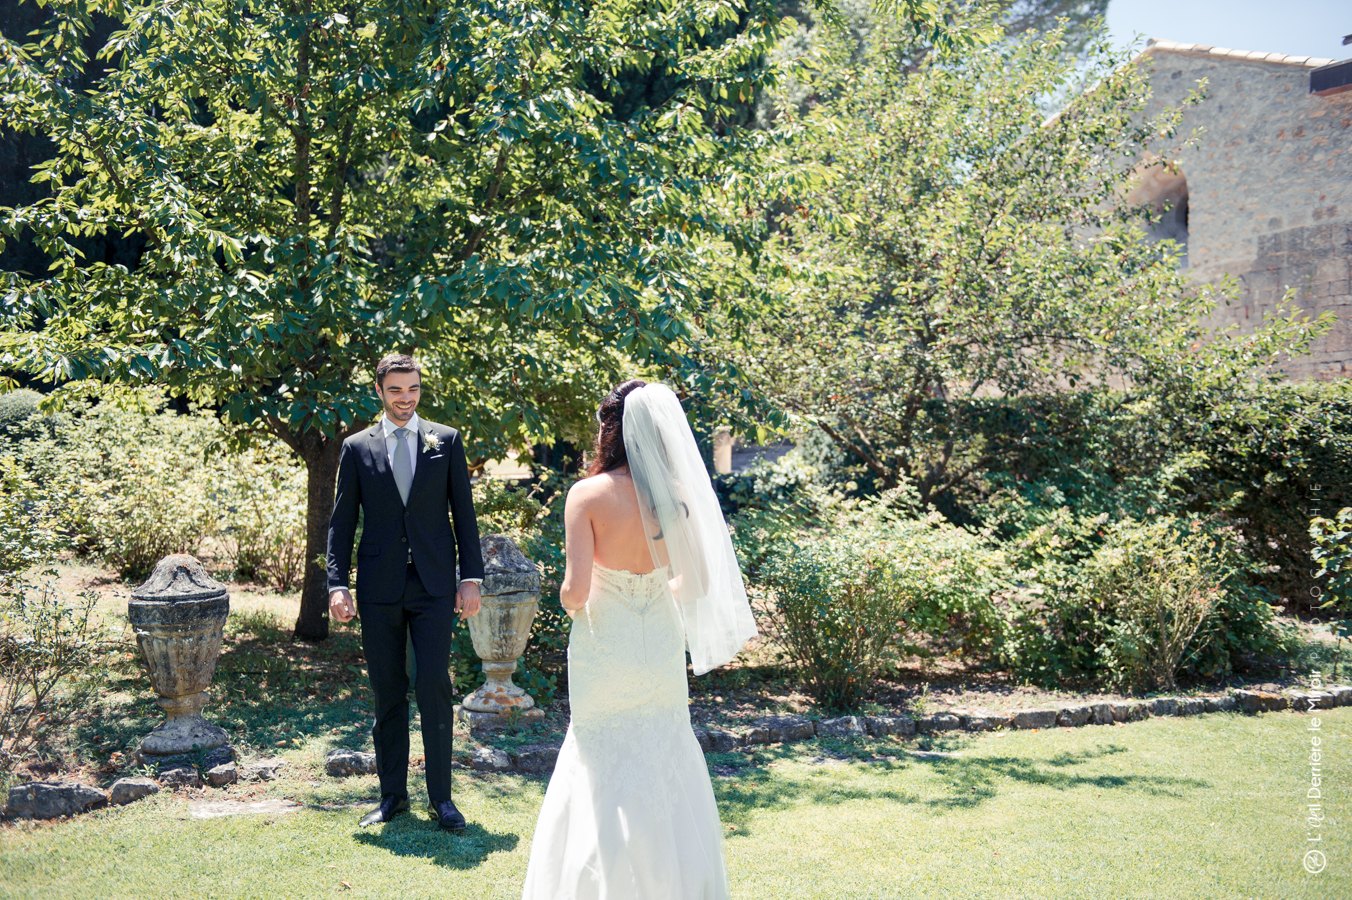 Photographe-mariage-Lorgues-83-KS-026